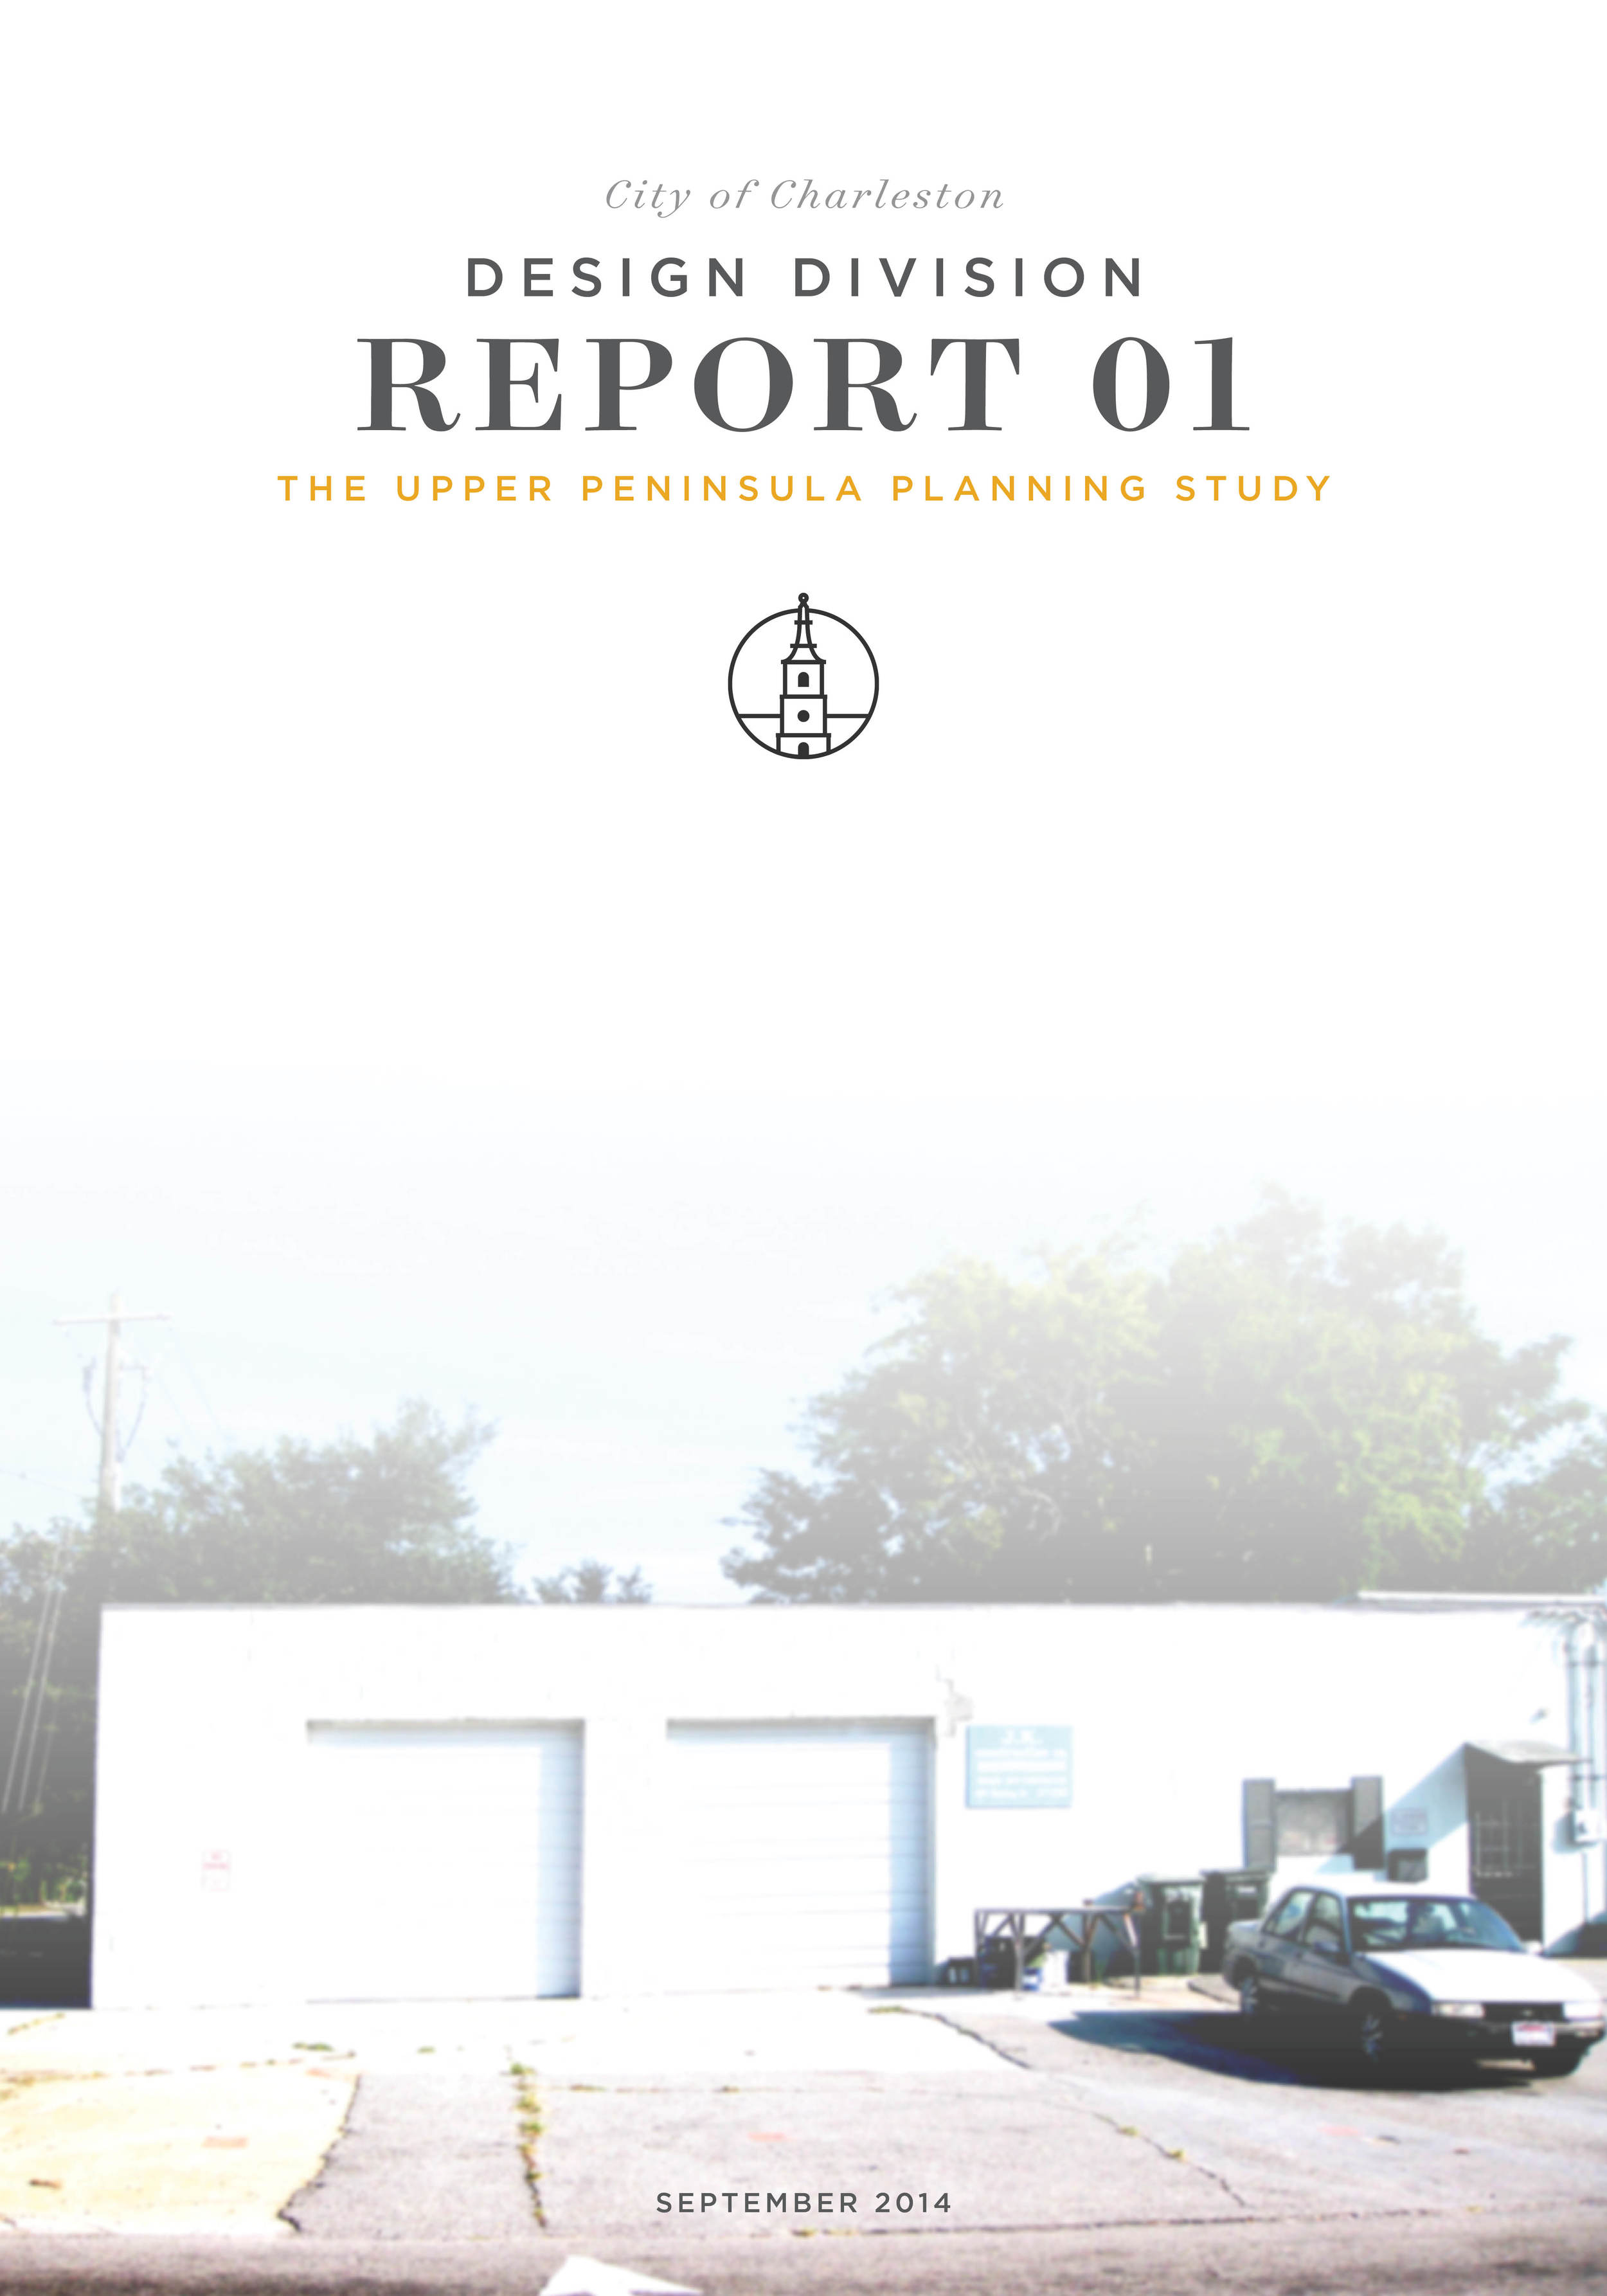 Report 01